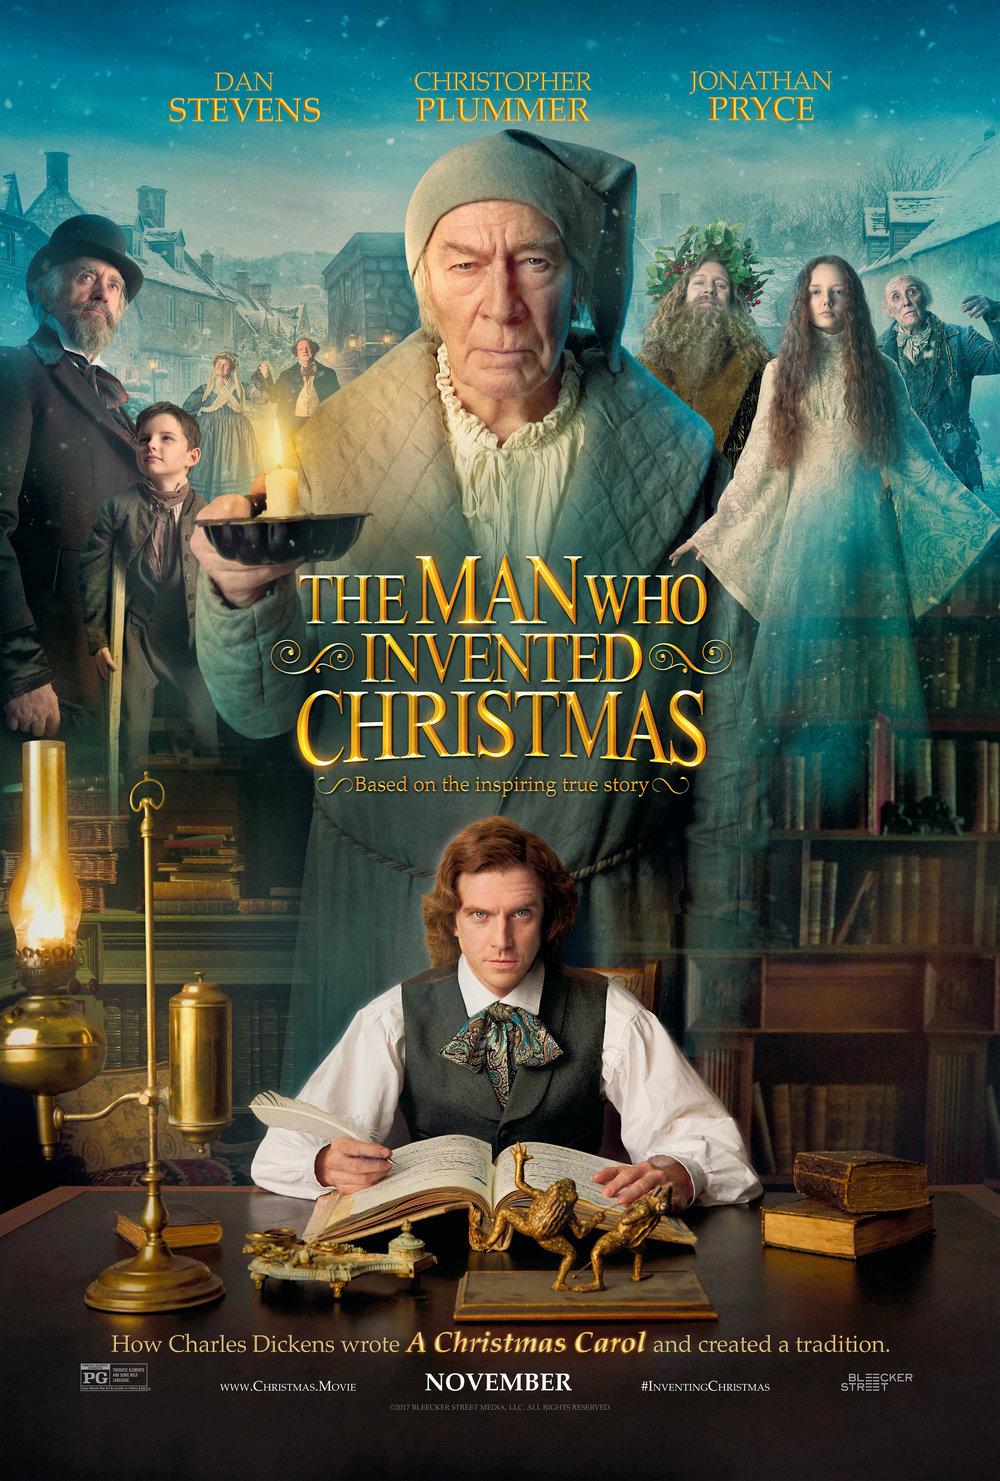 themanwhoinventedchristmas_movie.jpg